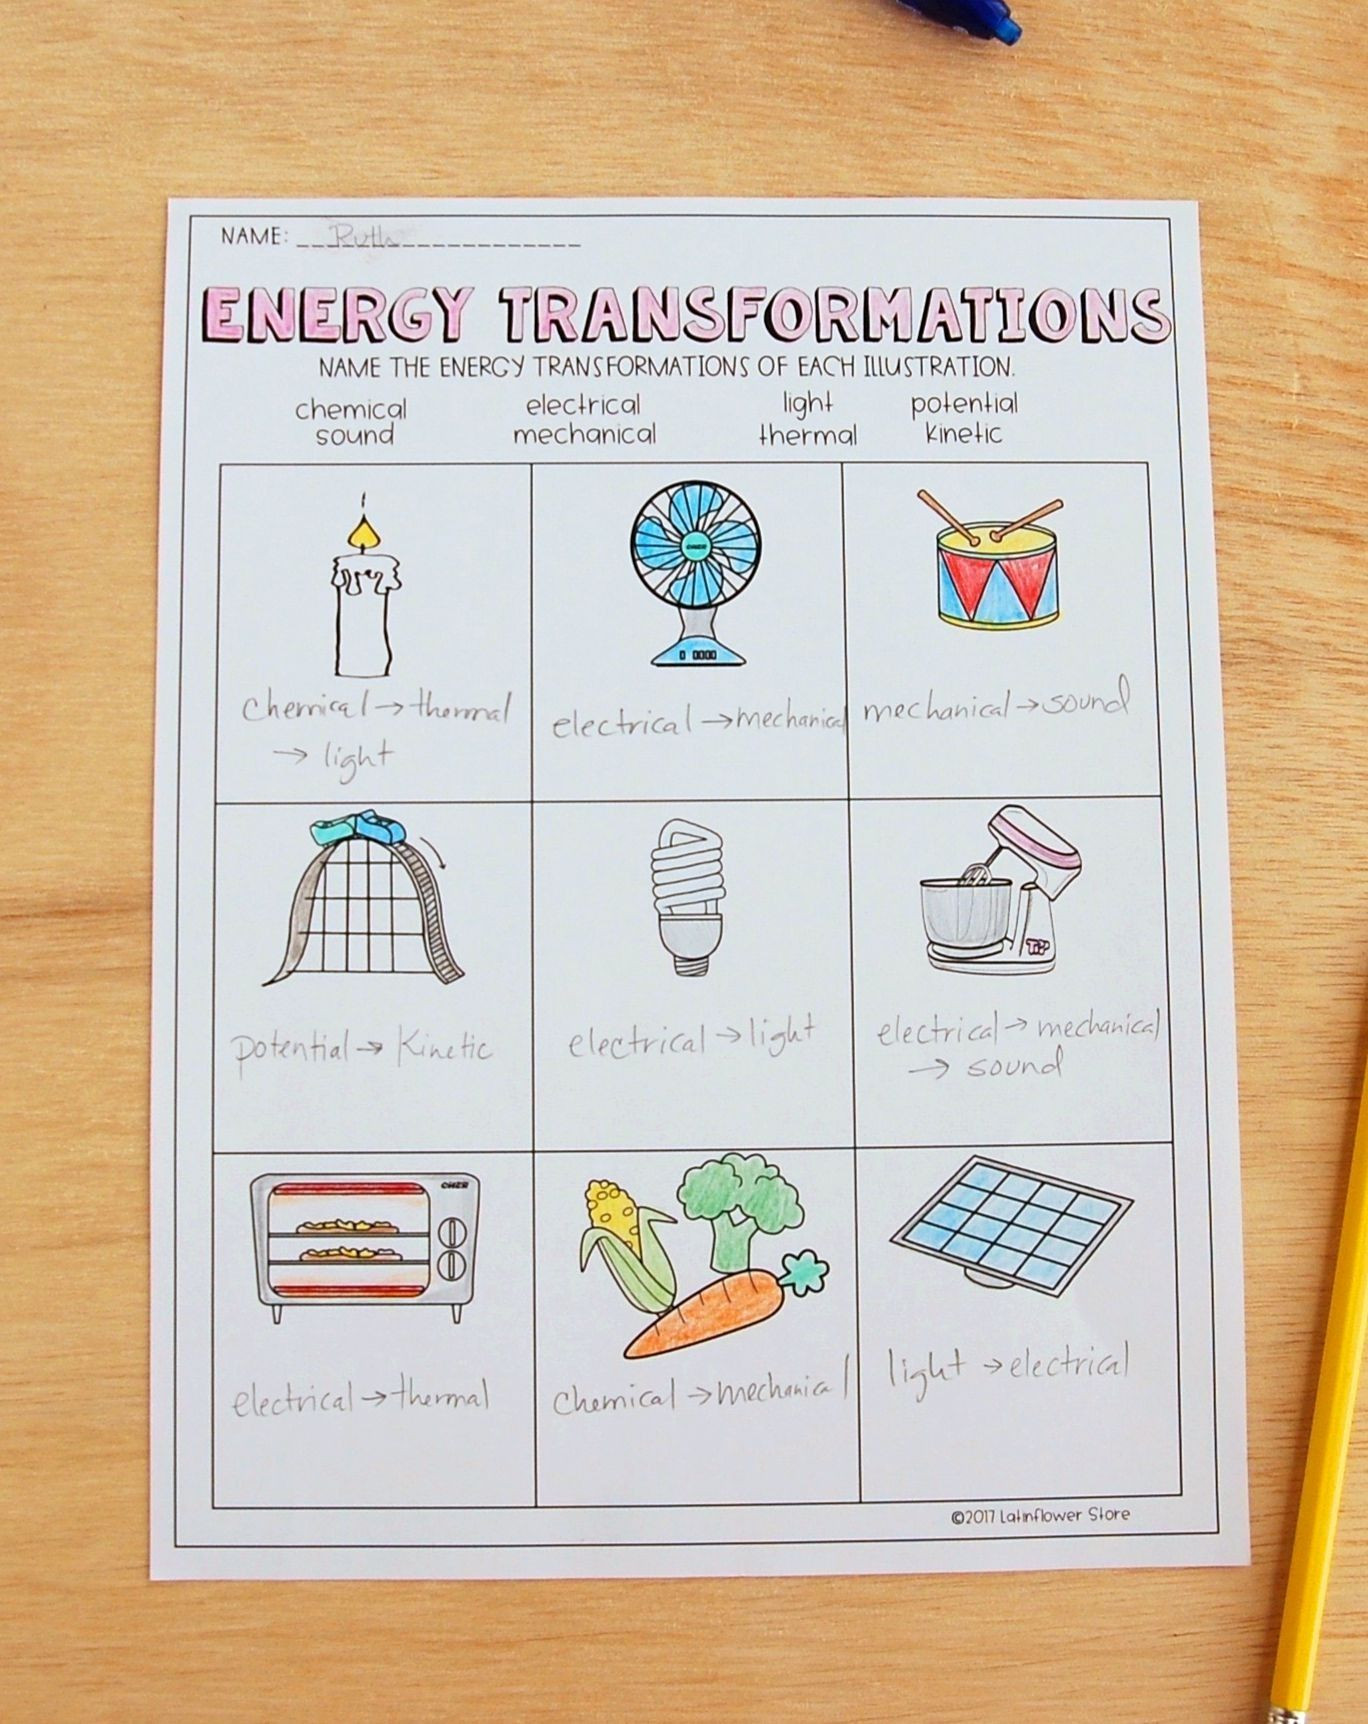 Energy Transformation Worksheet Answers Energy Transformations Worksheet